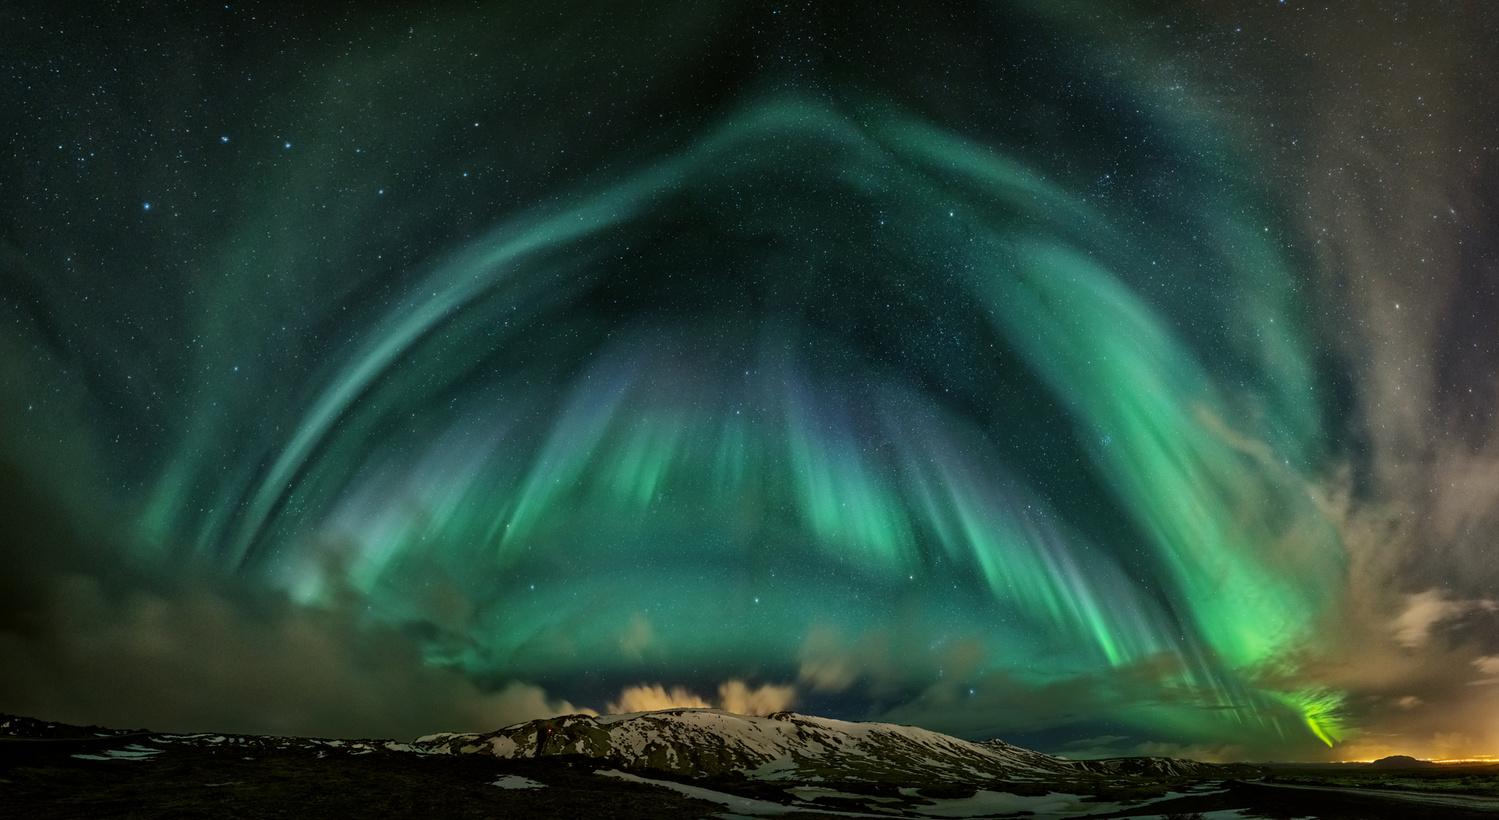 Northern lights in Iceland by Bragi Kort